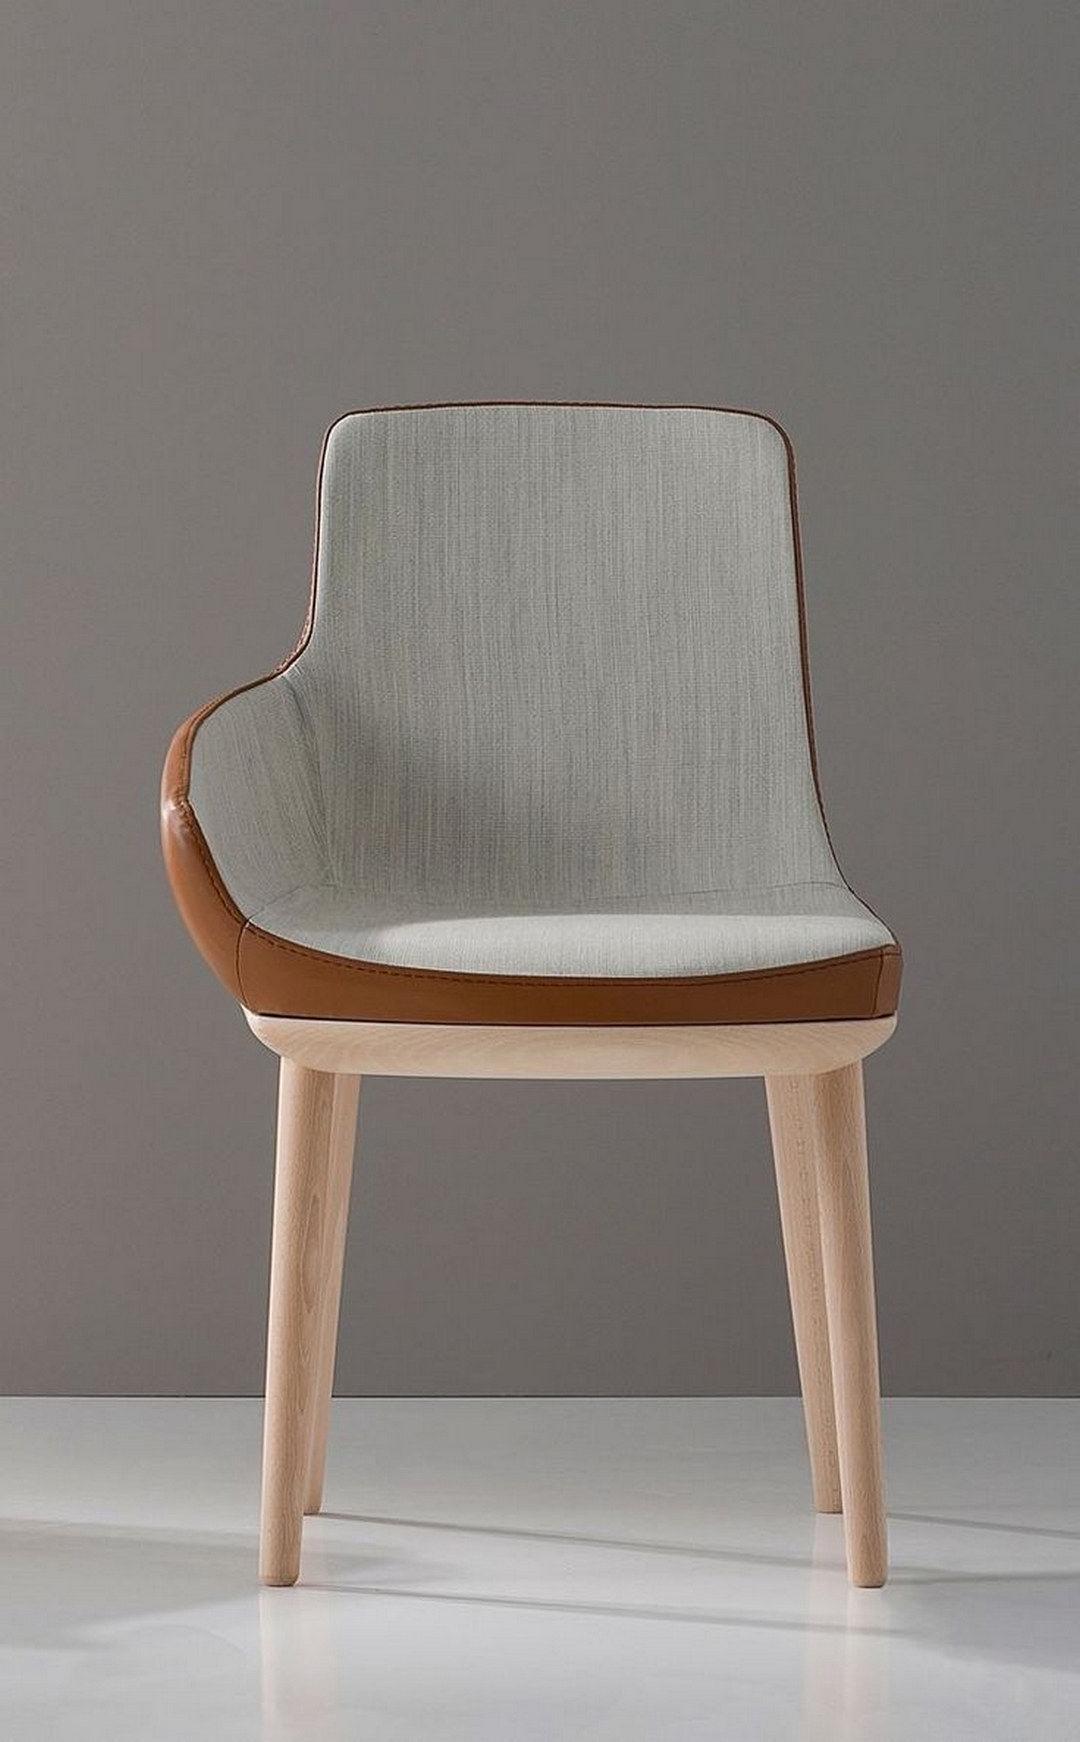 Fantastic Scandinavian Chair Design Idea 6 Chair Design Scandinavian Chairs Furniture Design Modern